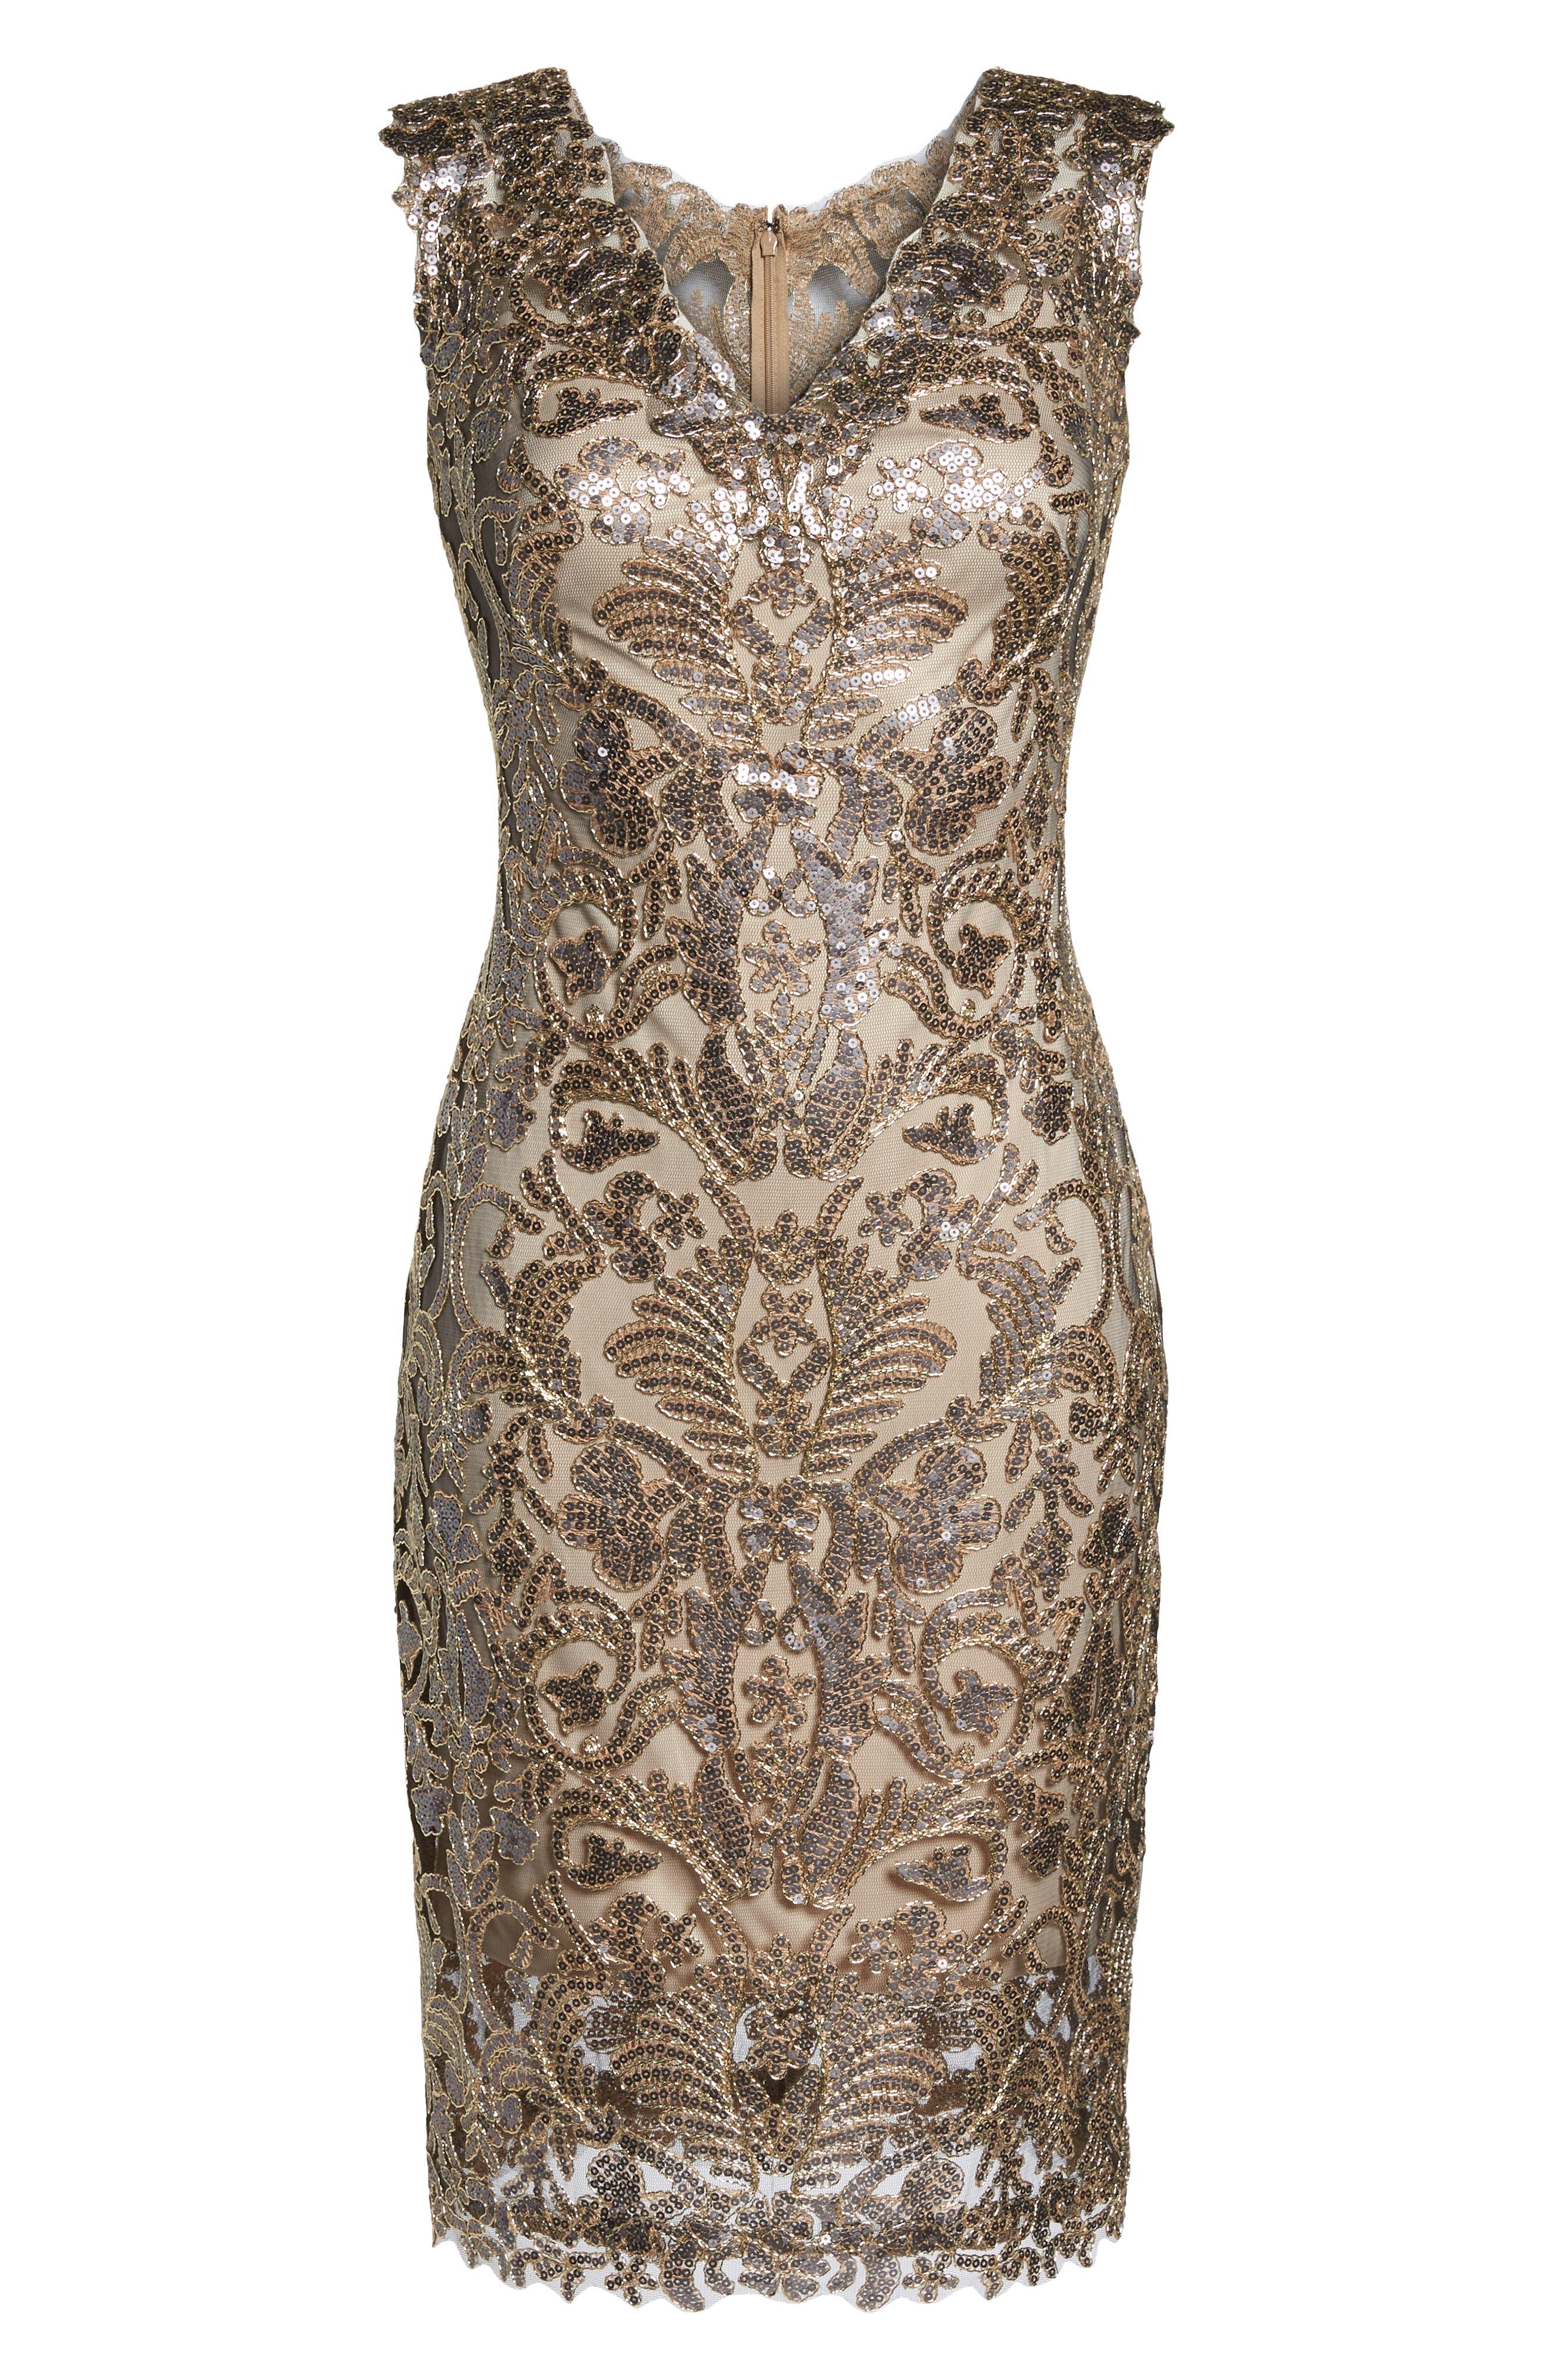 Sequin & Lace Sheath Dress,                             Alternate thumbnail 7, color,                             COPPER SHADOW